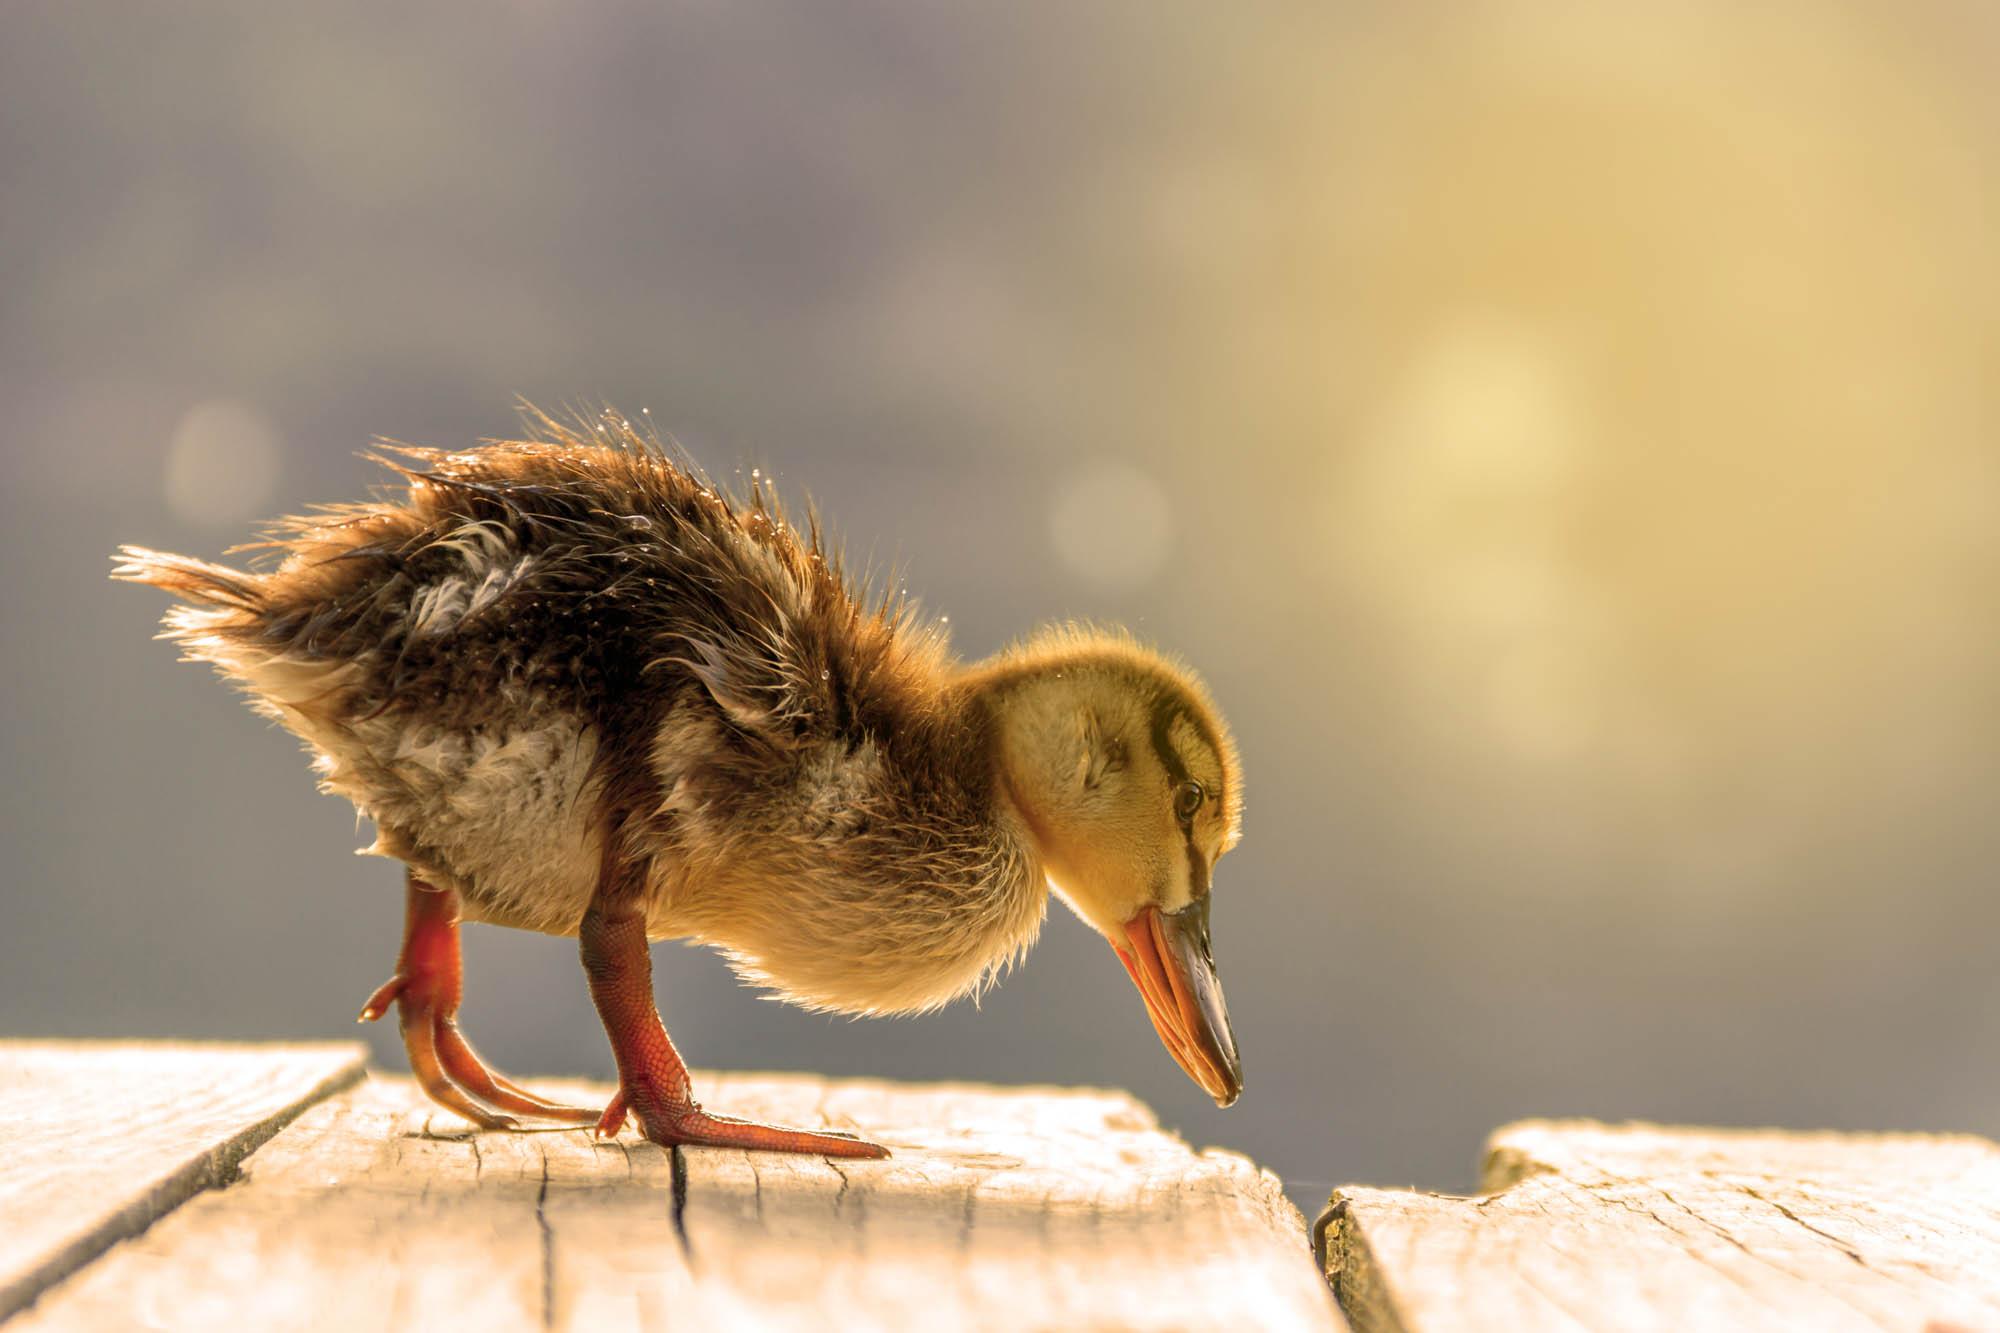 A cute duckling at sunrise